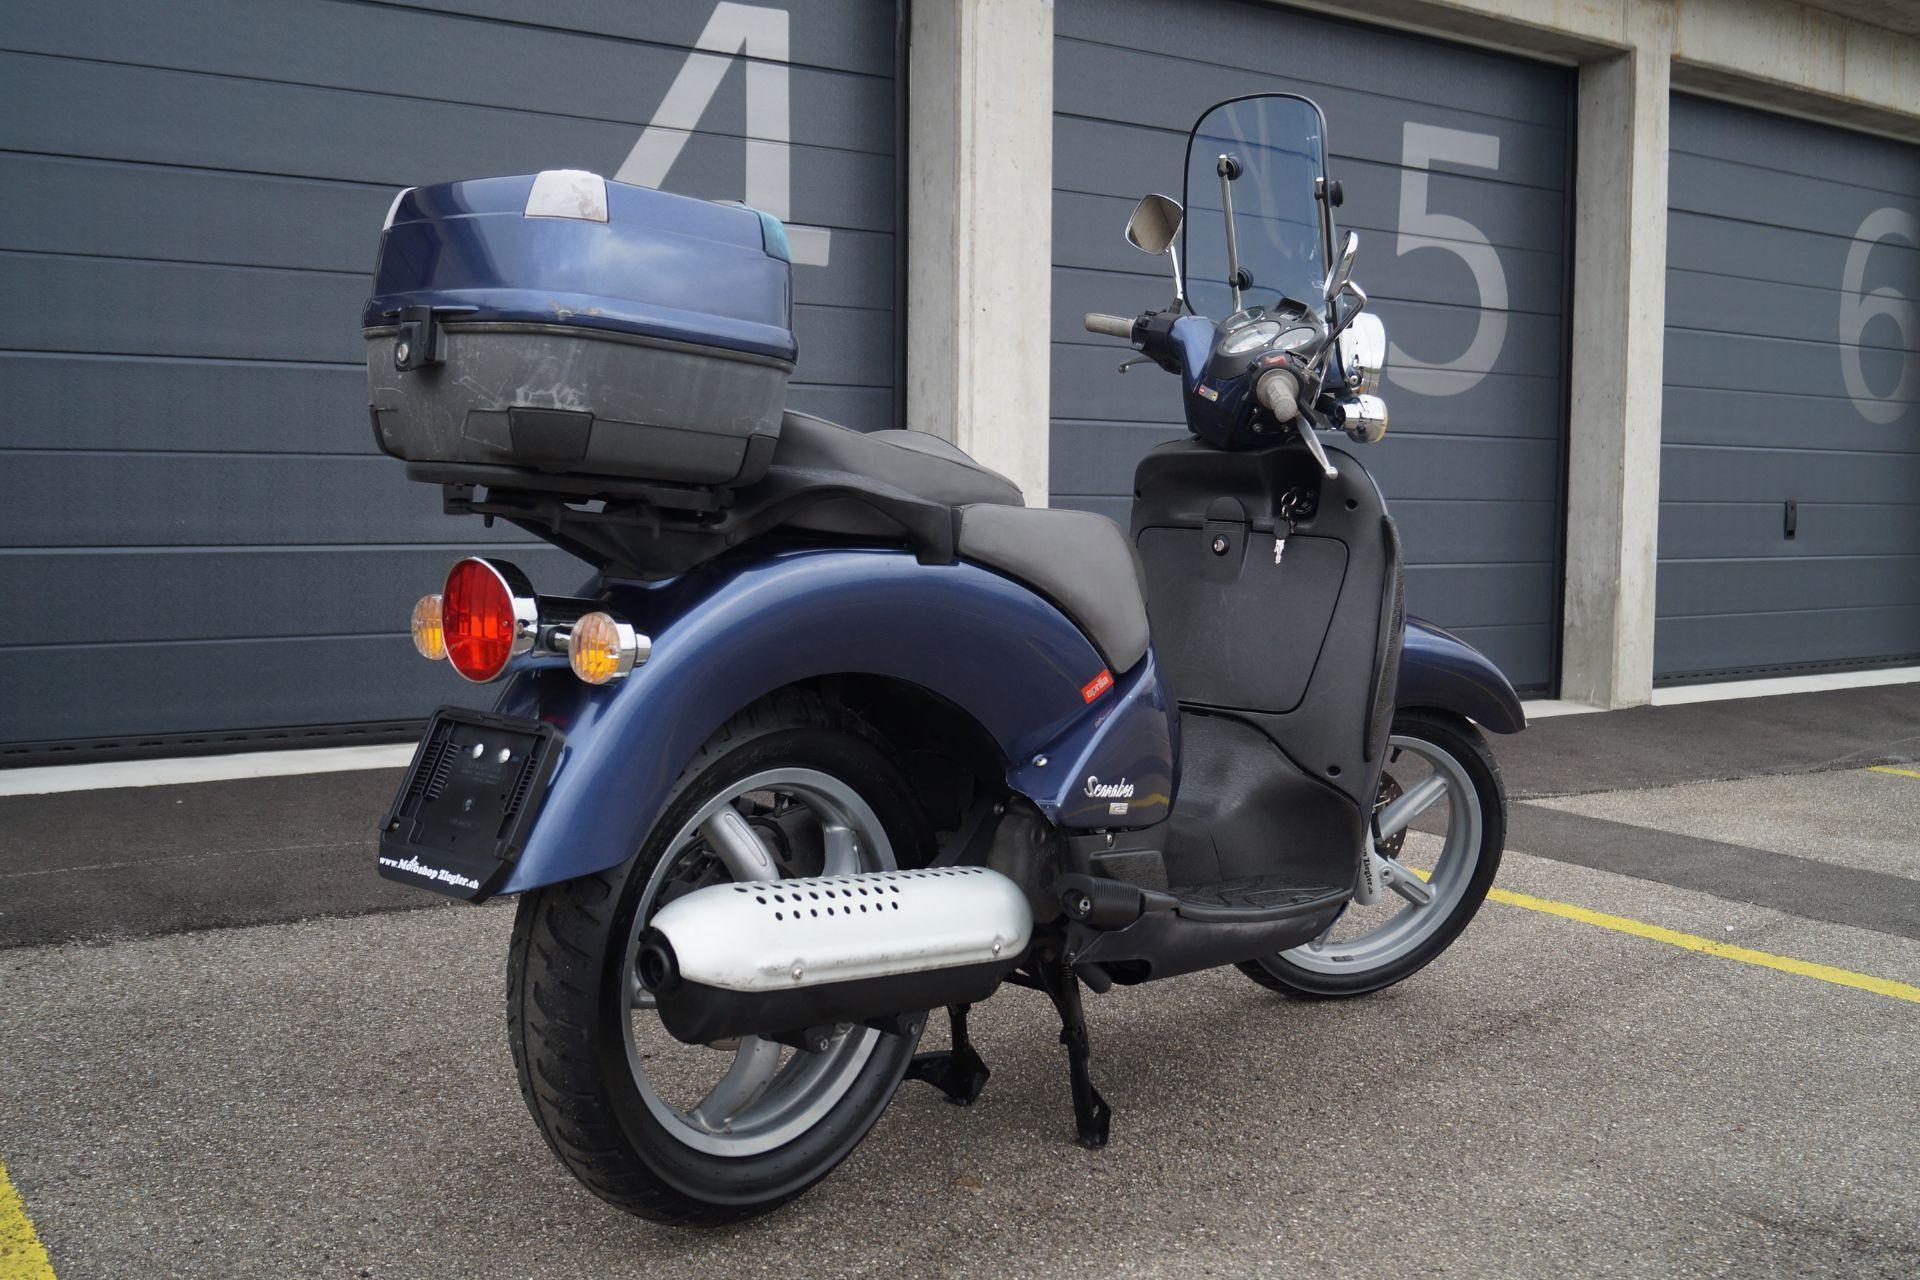 motorrad occasion kaufen aprilia scarabeo 125 motoshop. Black Bedroom Furniture Sets. Home Design Ideas